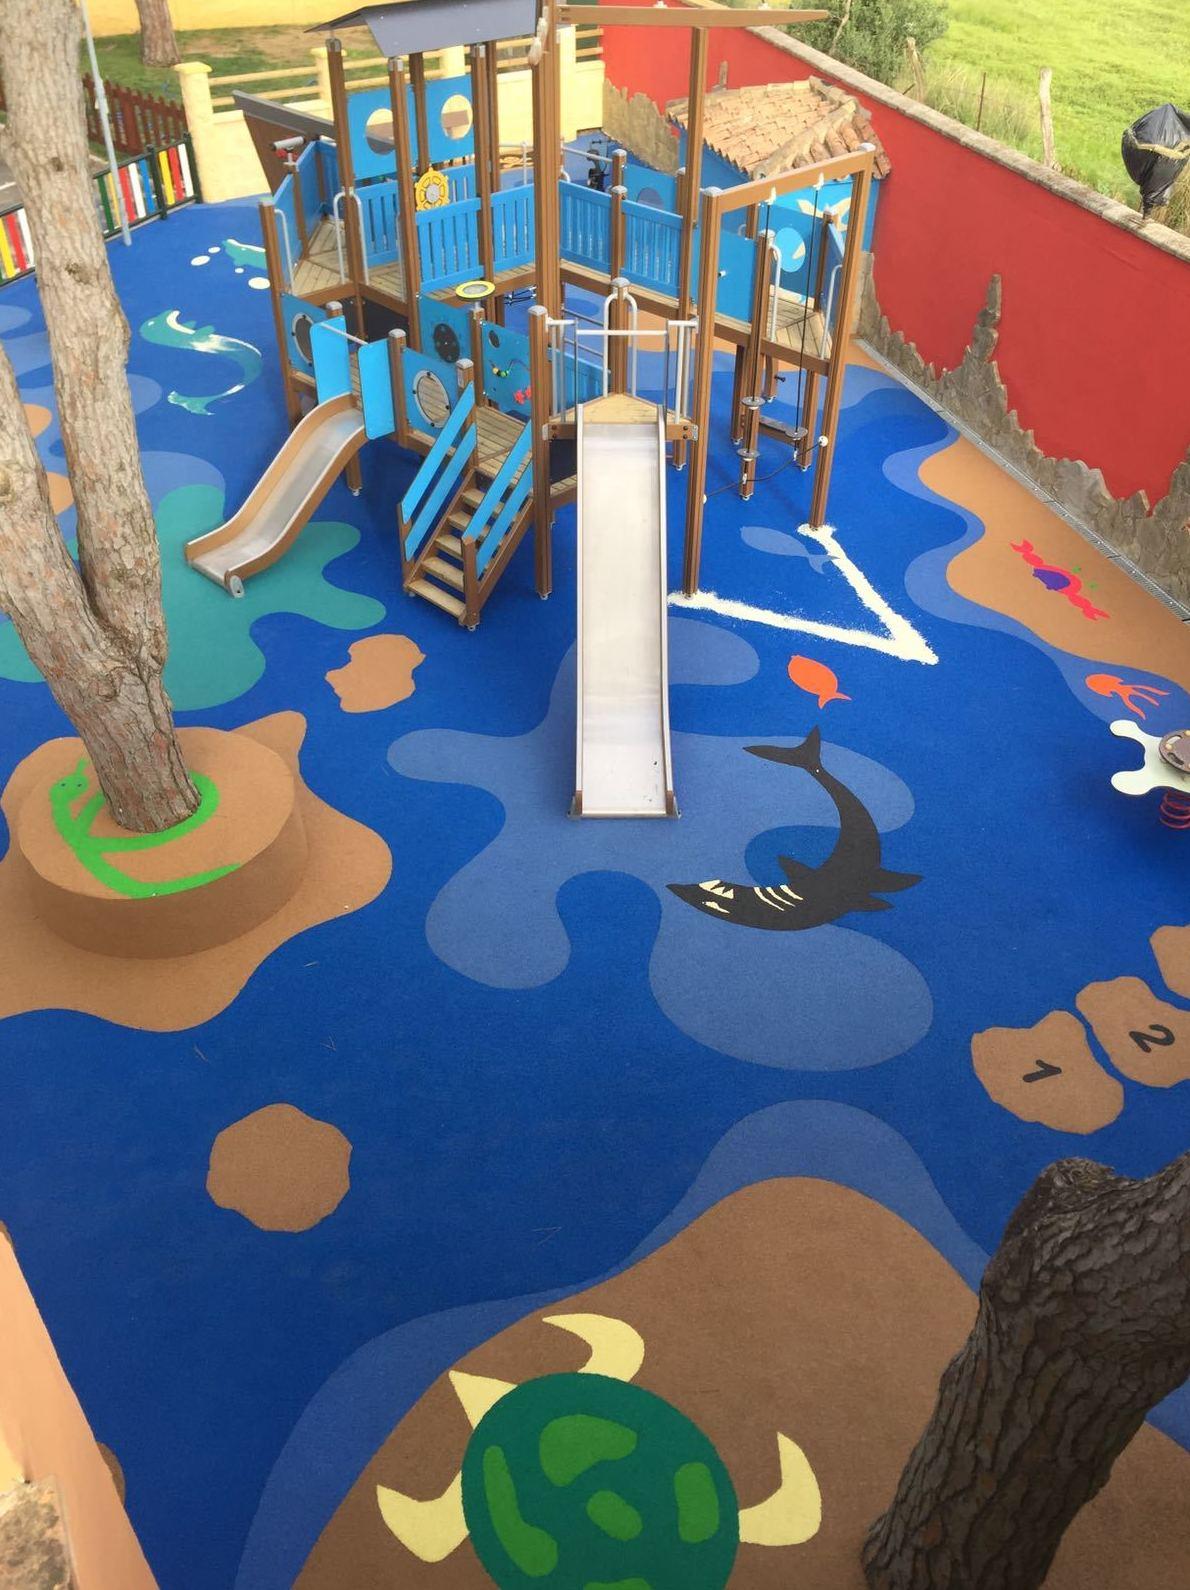 Foto 61 de Instalación de pavimentos de caucho para parques infantiles en Las Cabezas de San Juan | Pavimentos Garvel